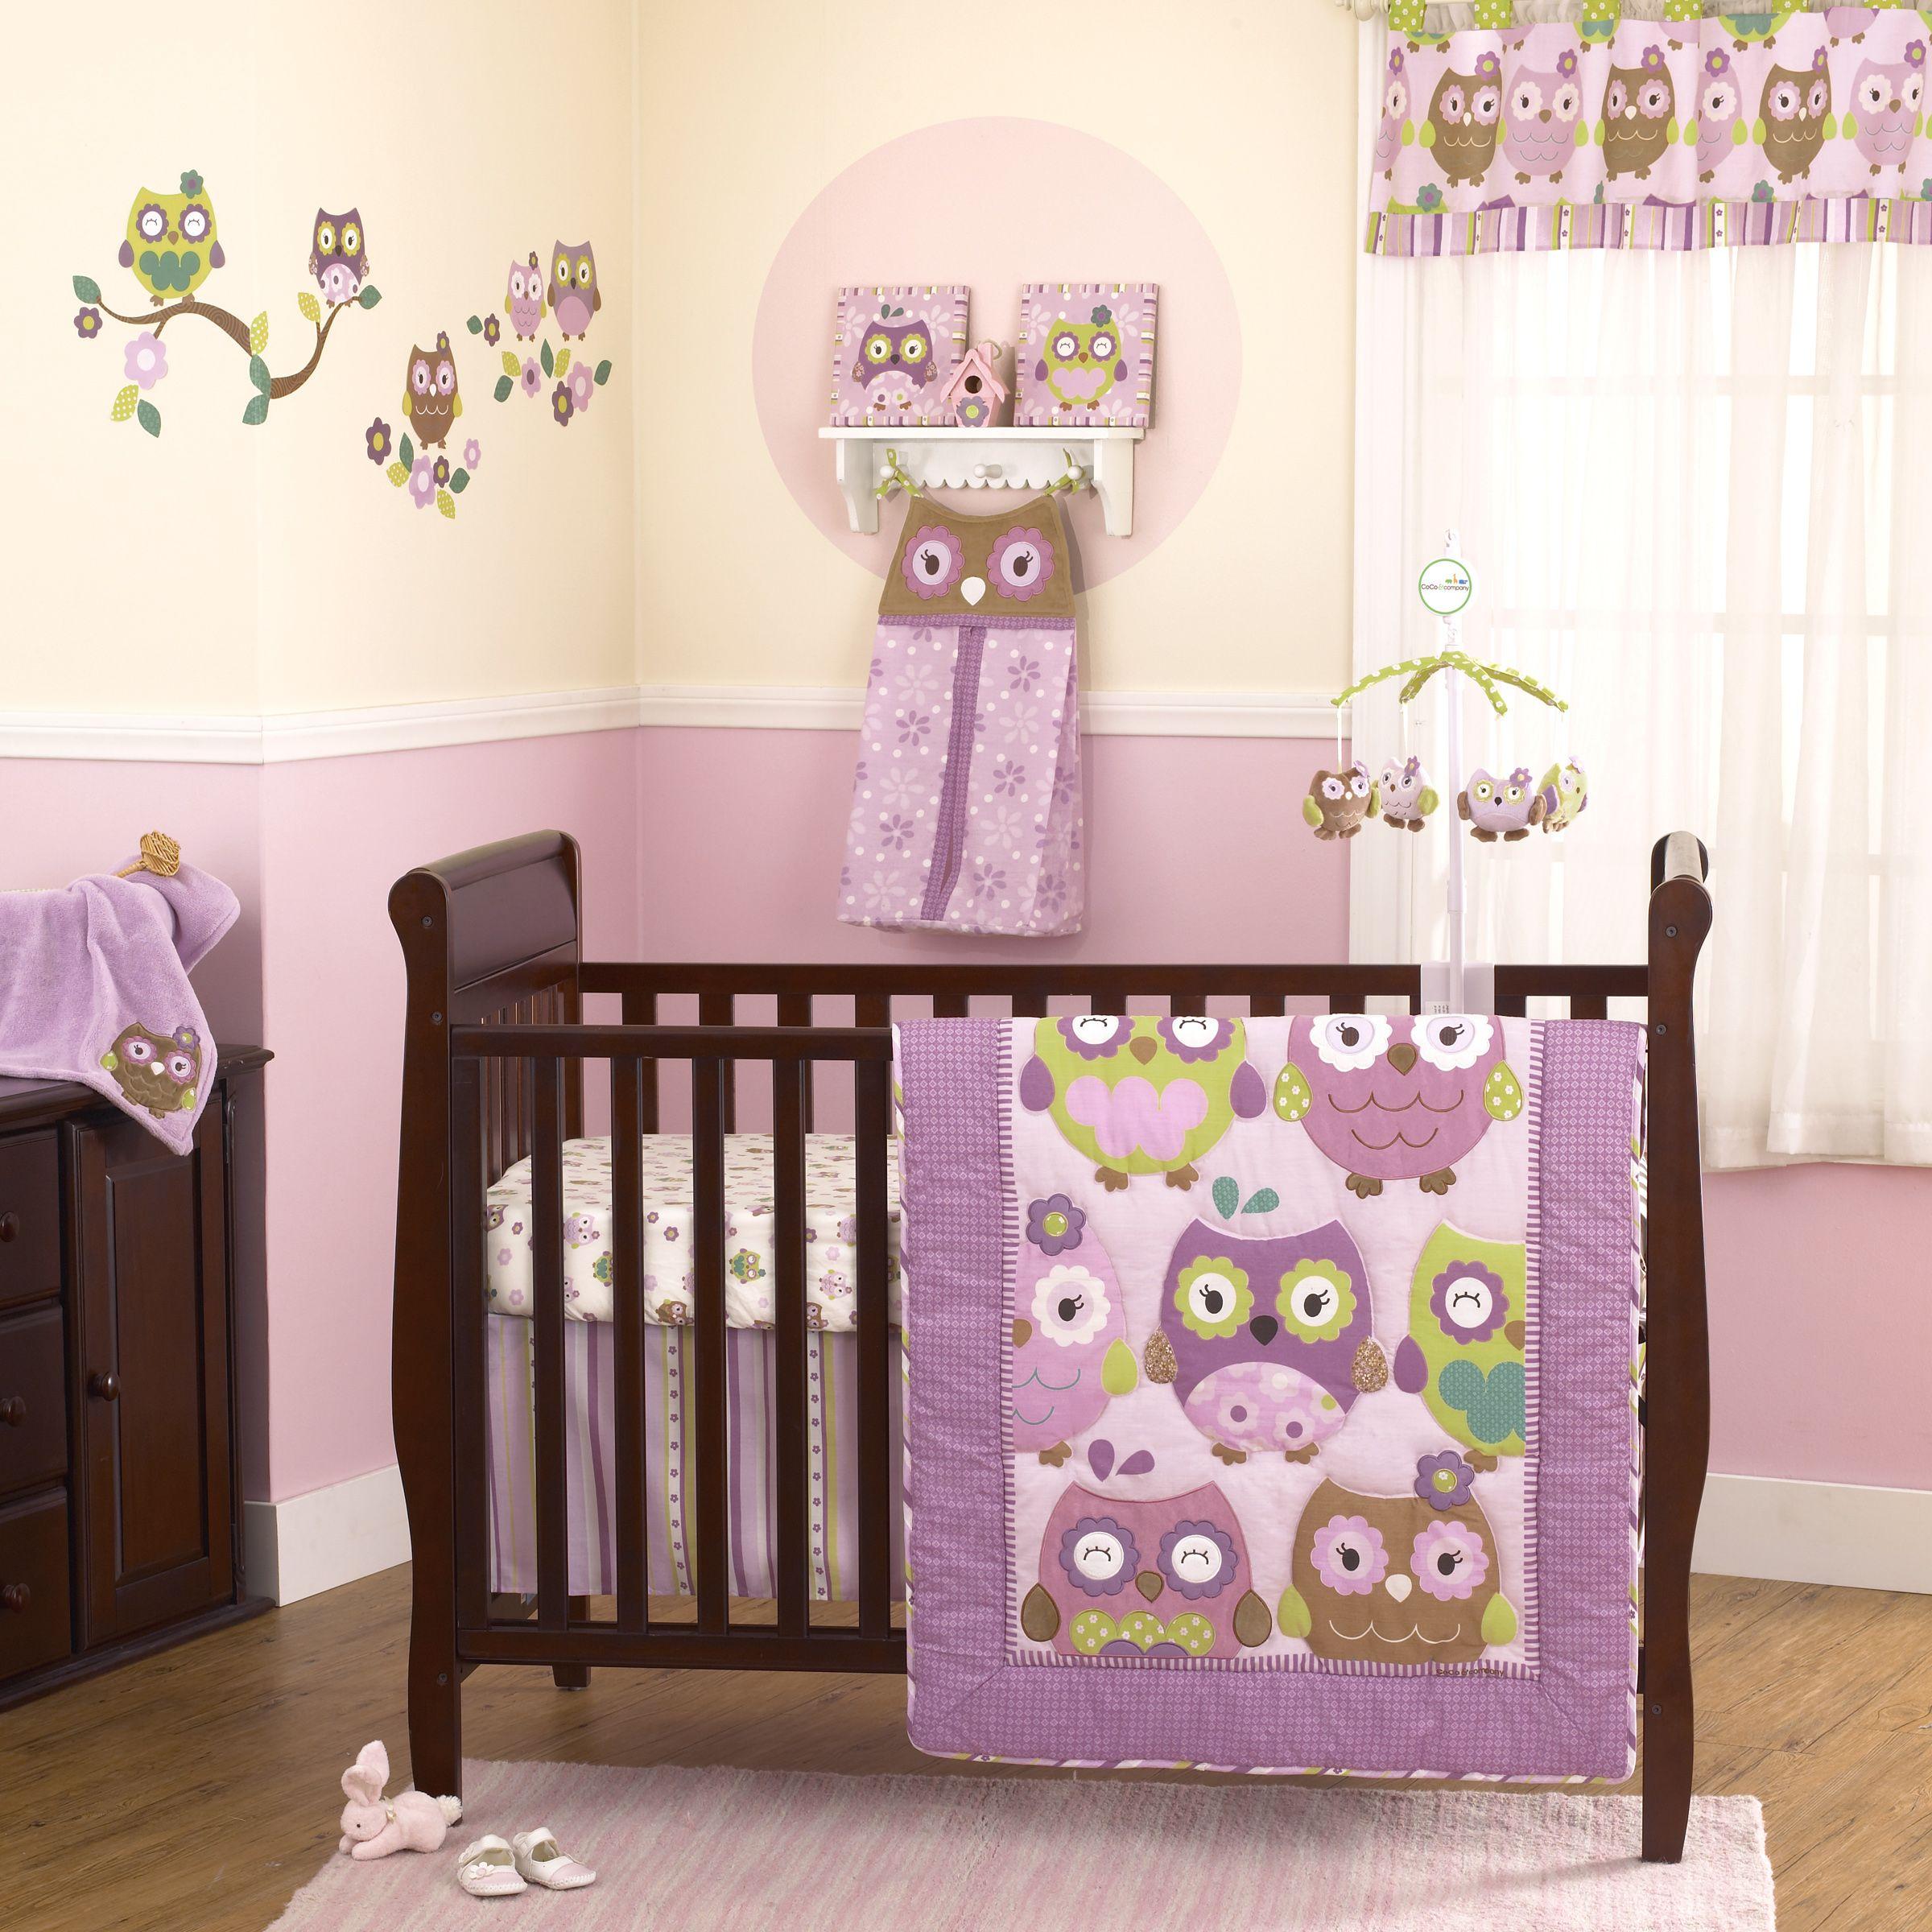 Owl Wonderland Collection Crib Bedding Girl Owl Crib Bedding